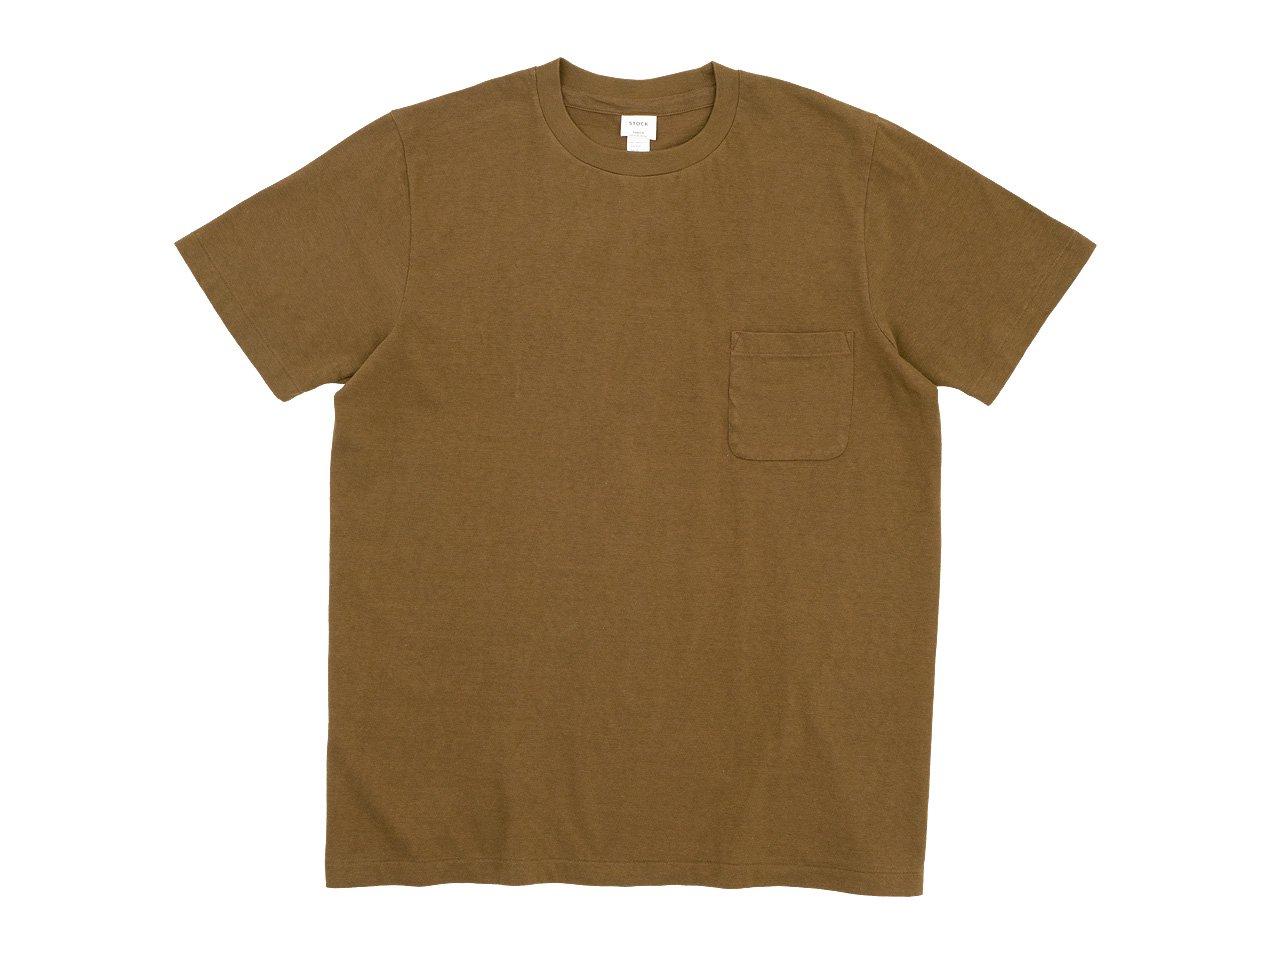 YAECA STOCK ポケットTシャツ BROWN 〔メンズ〕